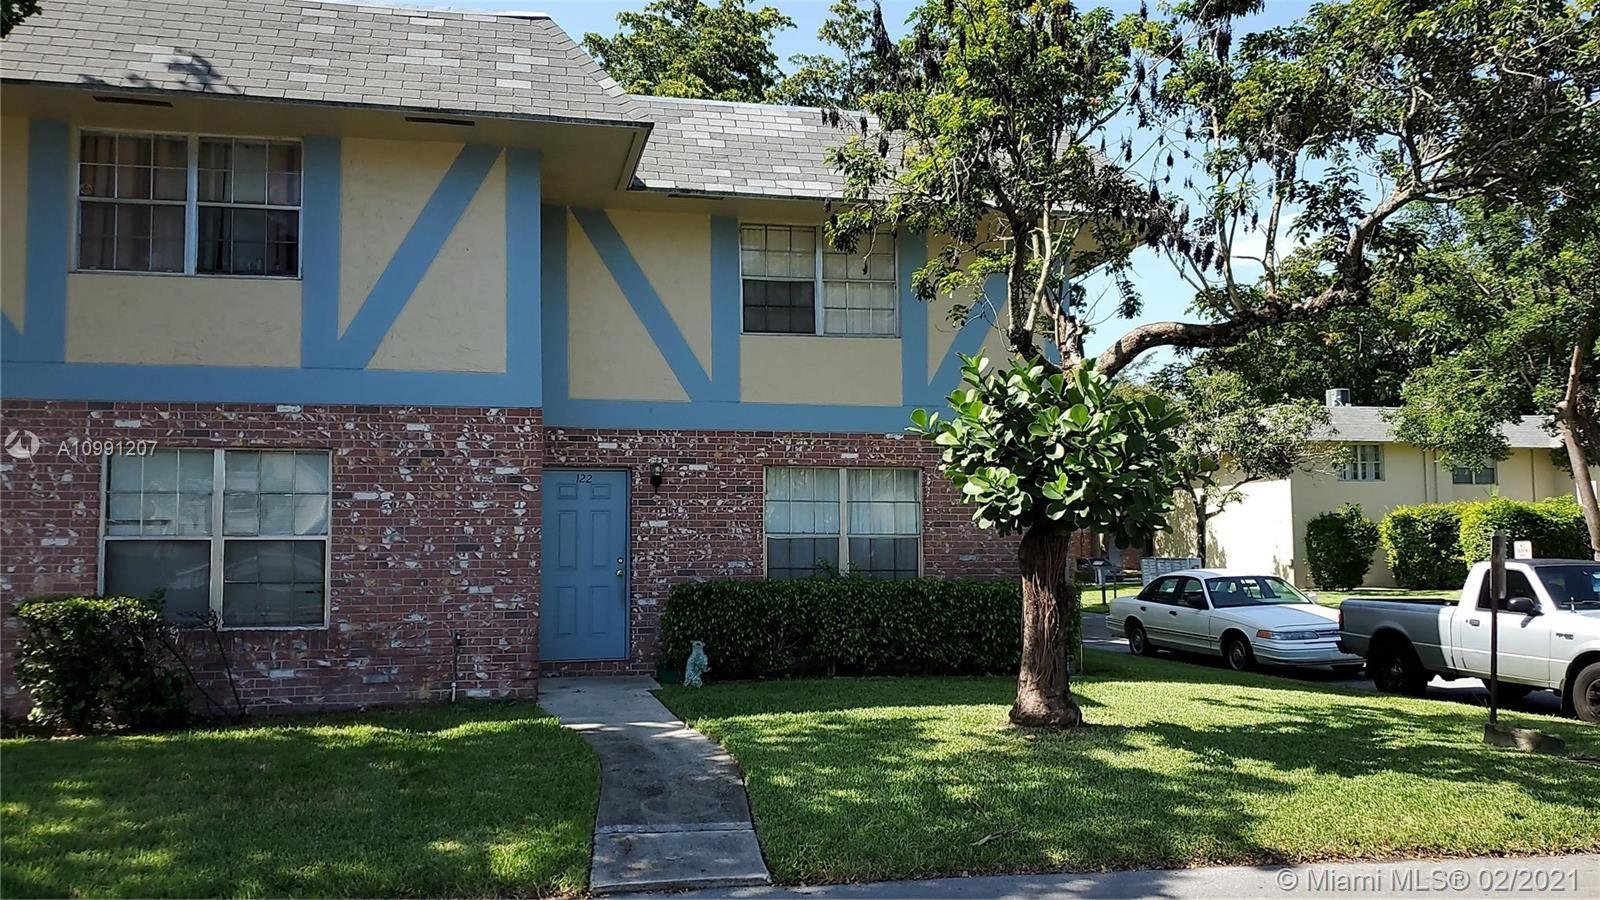 7505 Kimberly Blvd #122, North Lauderdale, FL 33068 - #: A10991207